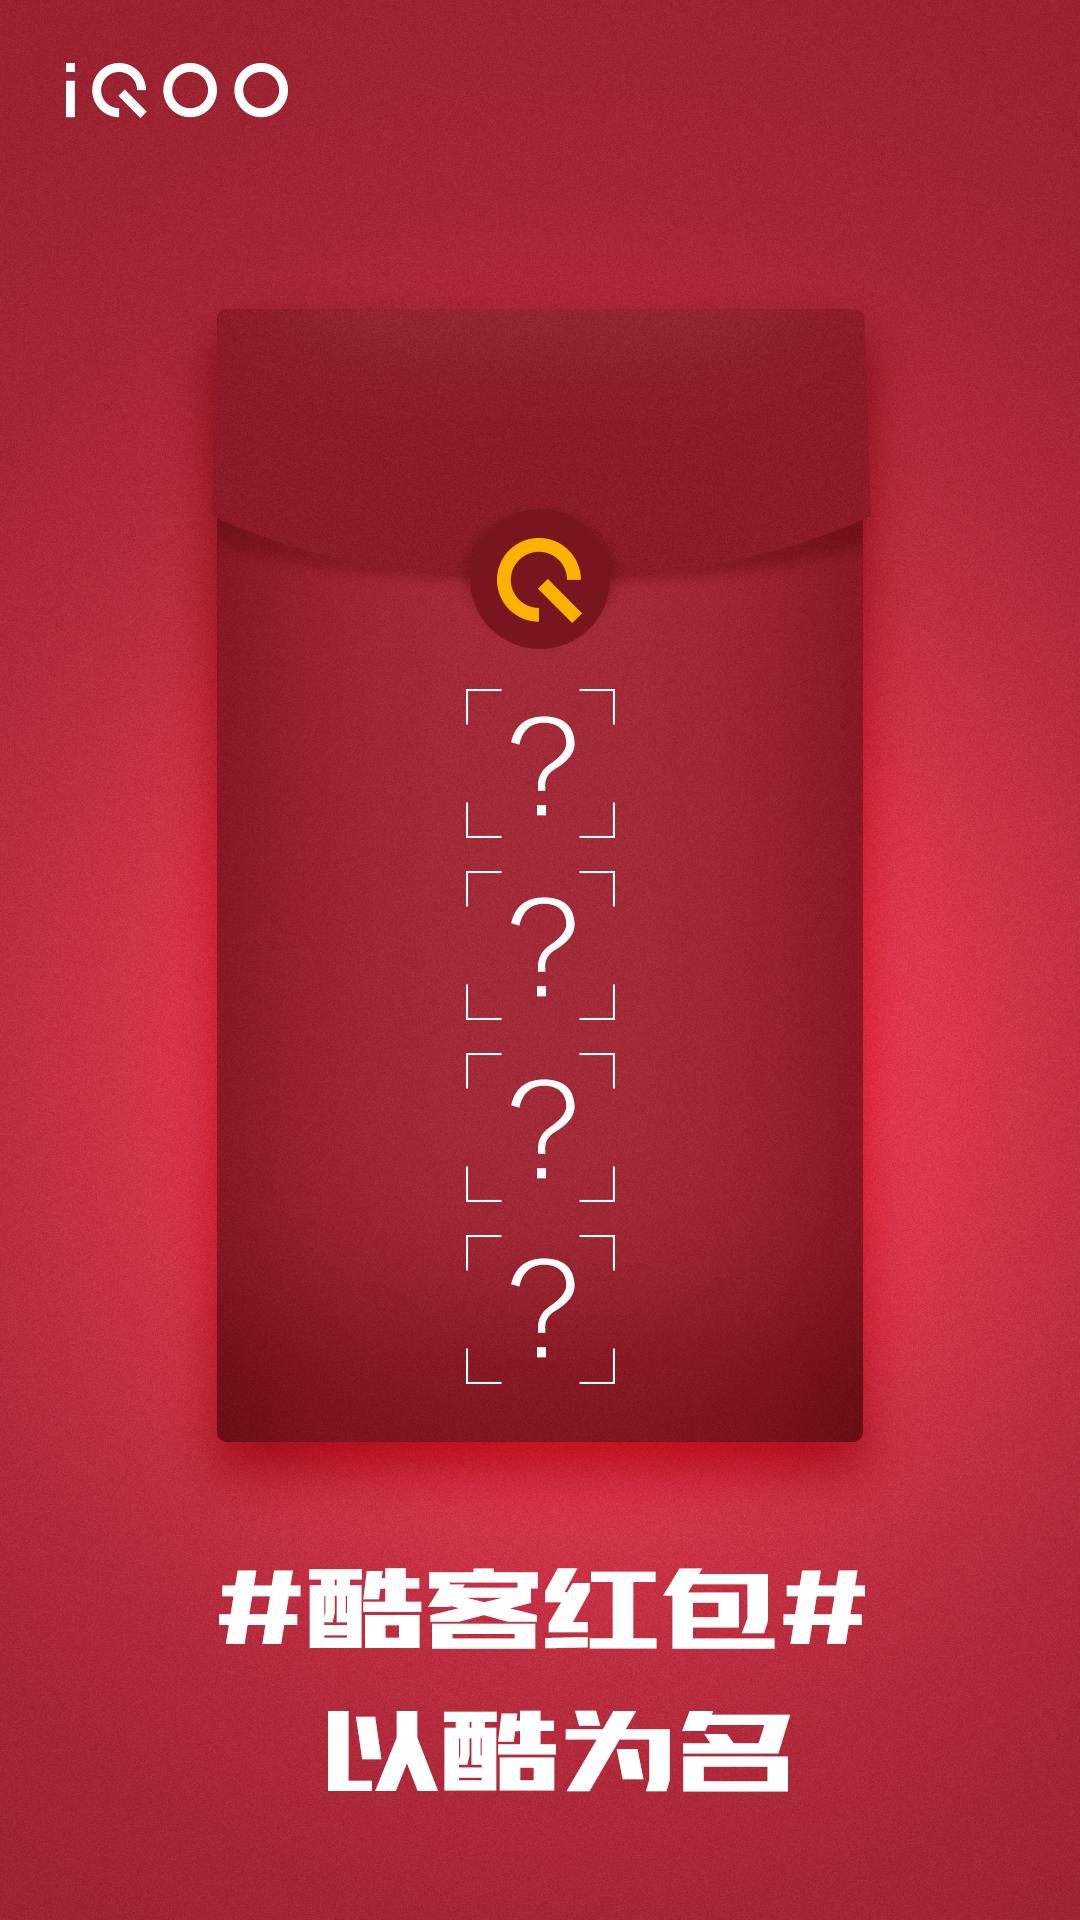 iQOO新春利是封-文案征集活动-1.jpg